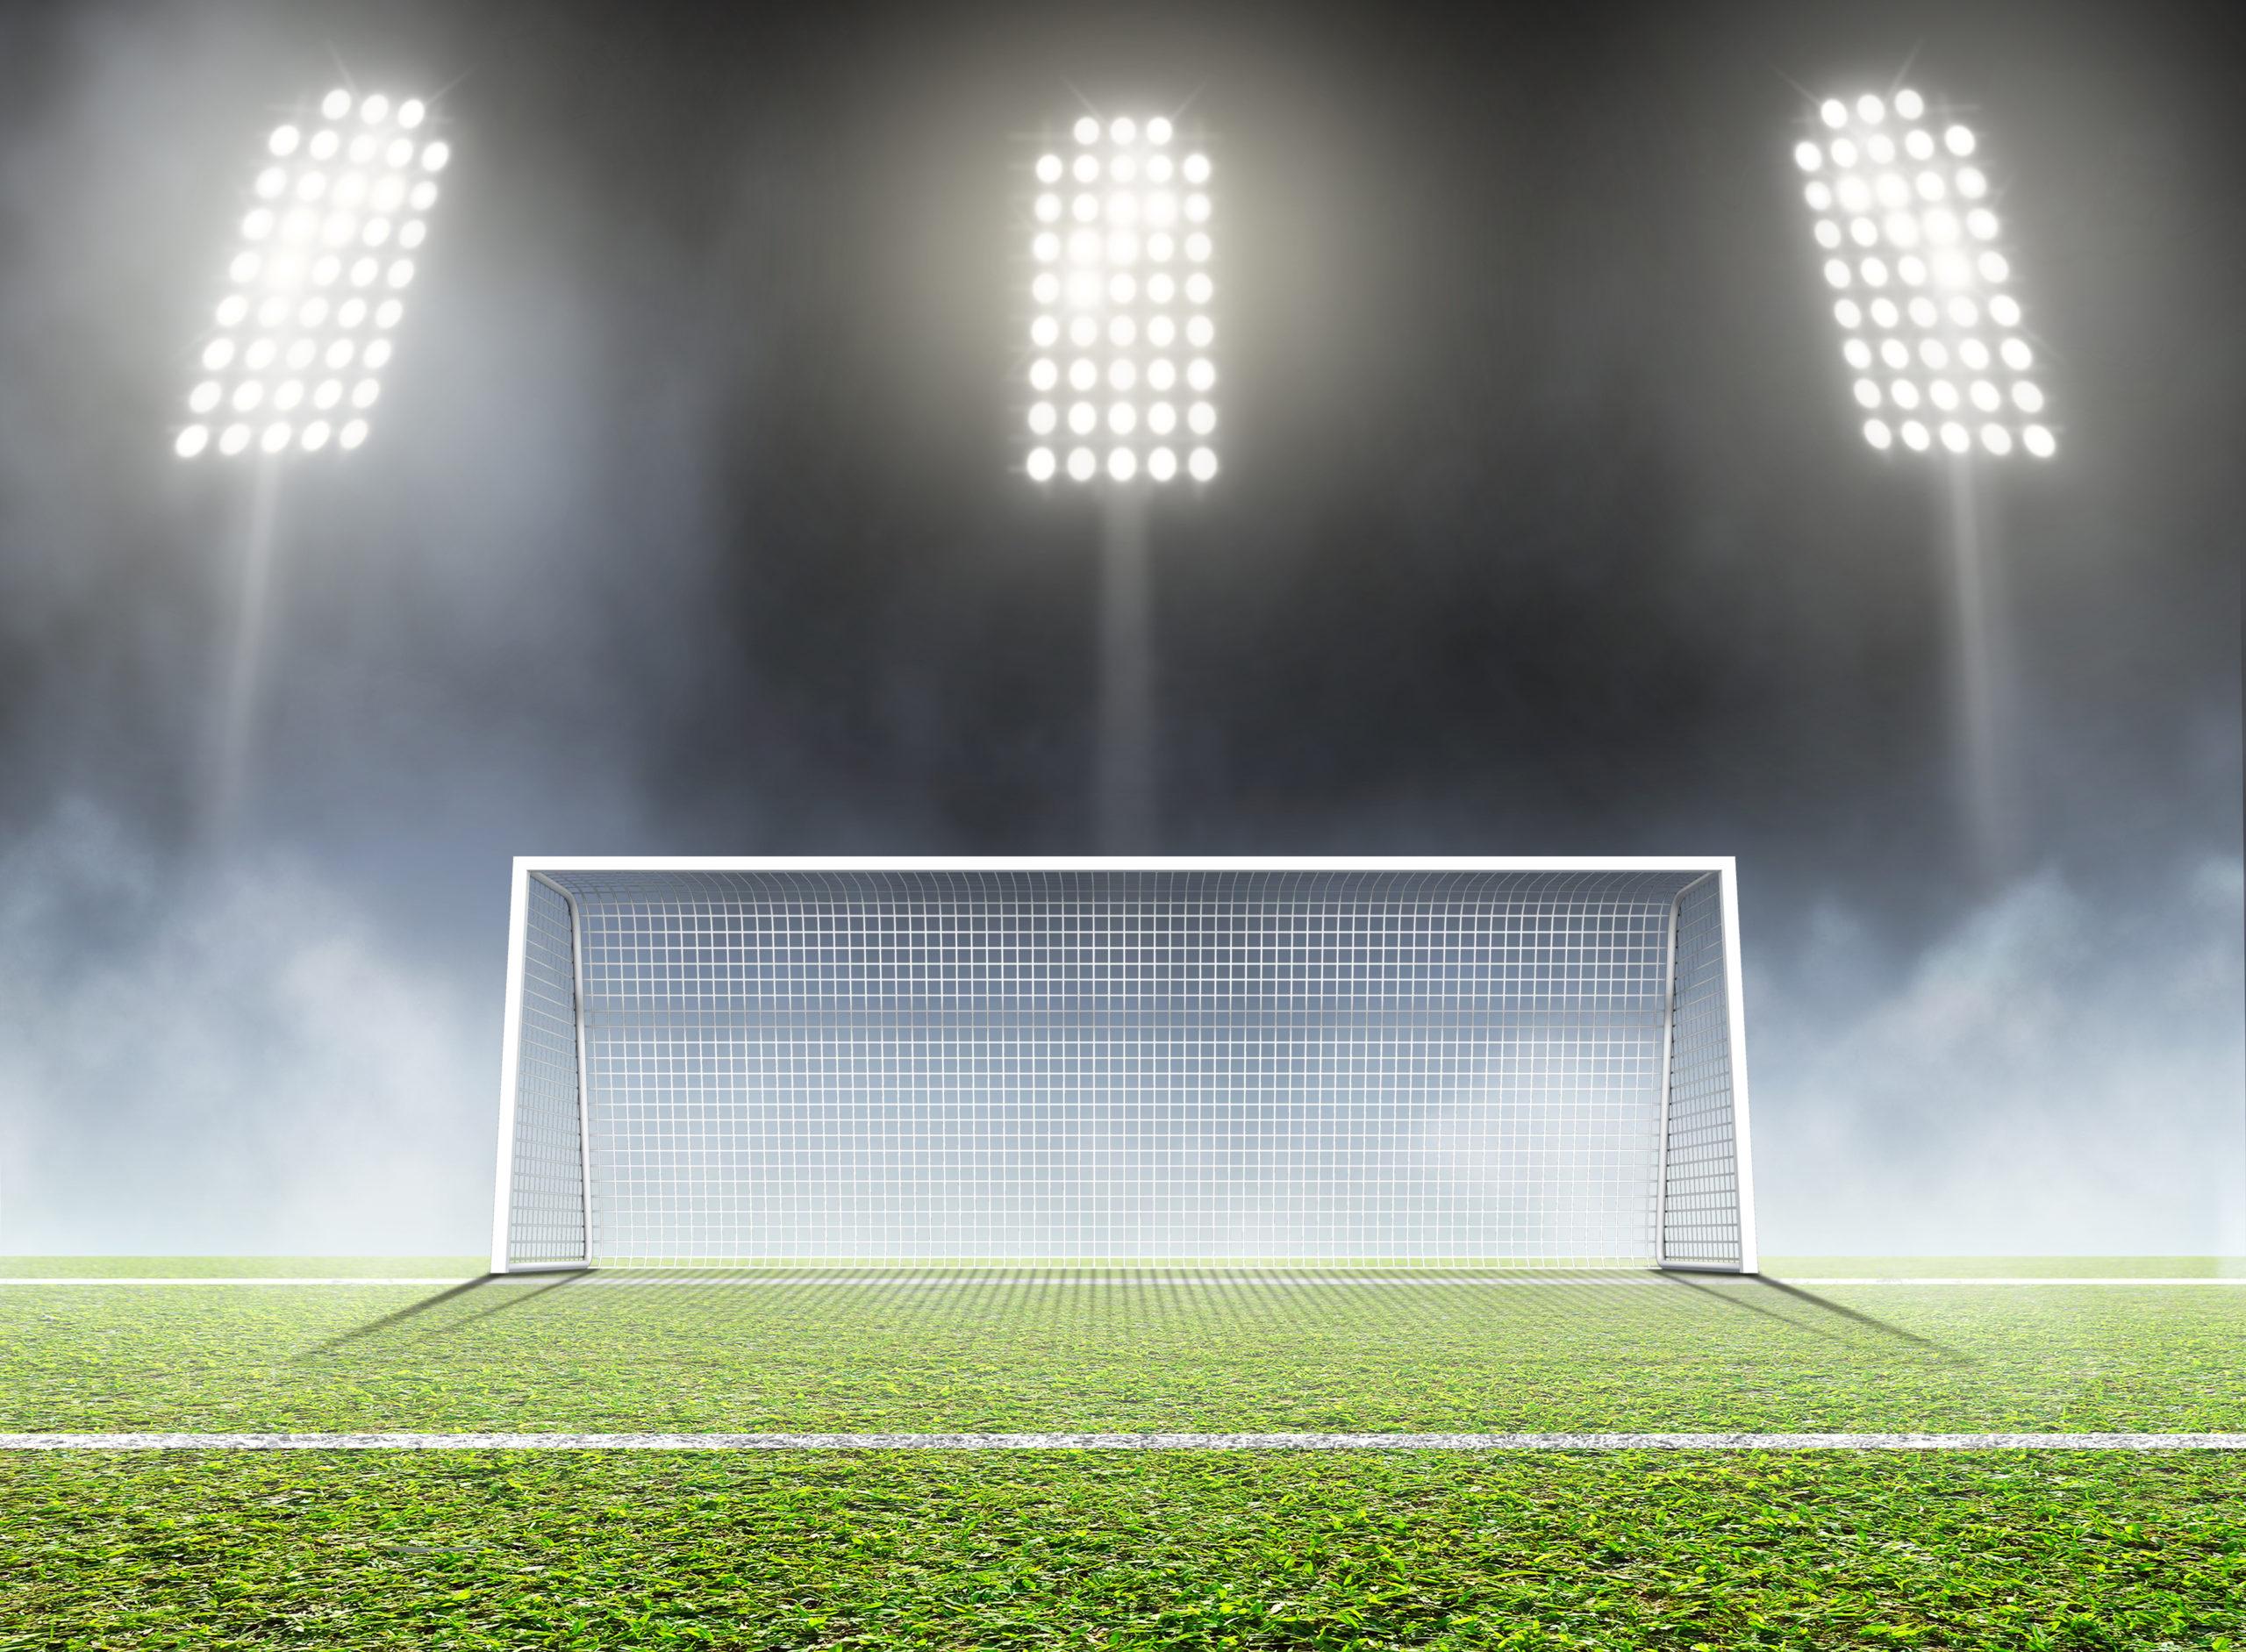 LED sportveldverlichting Wijnhovens totaaloplossing bespaart geld